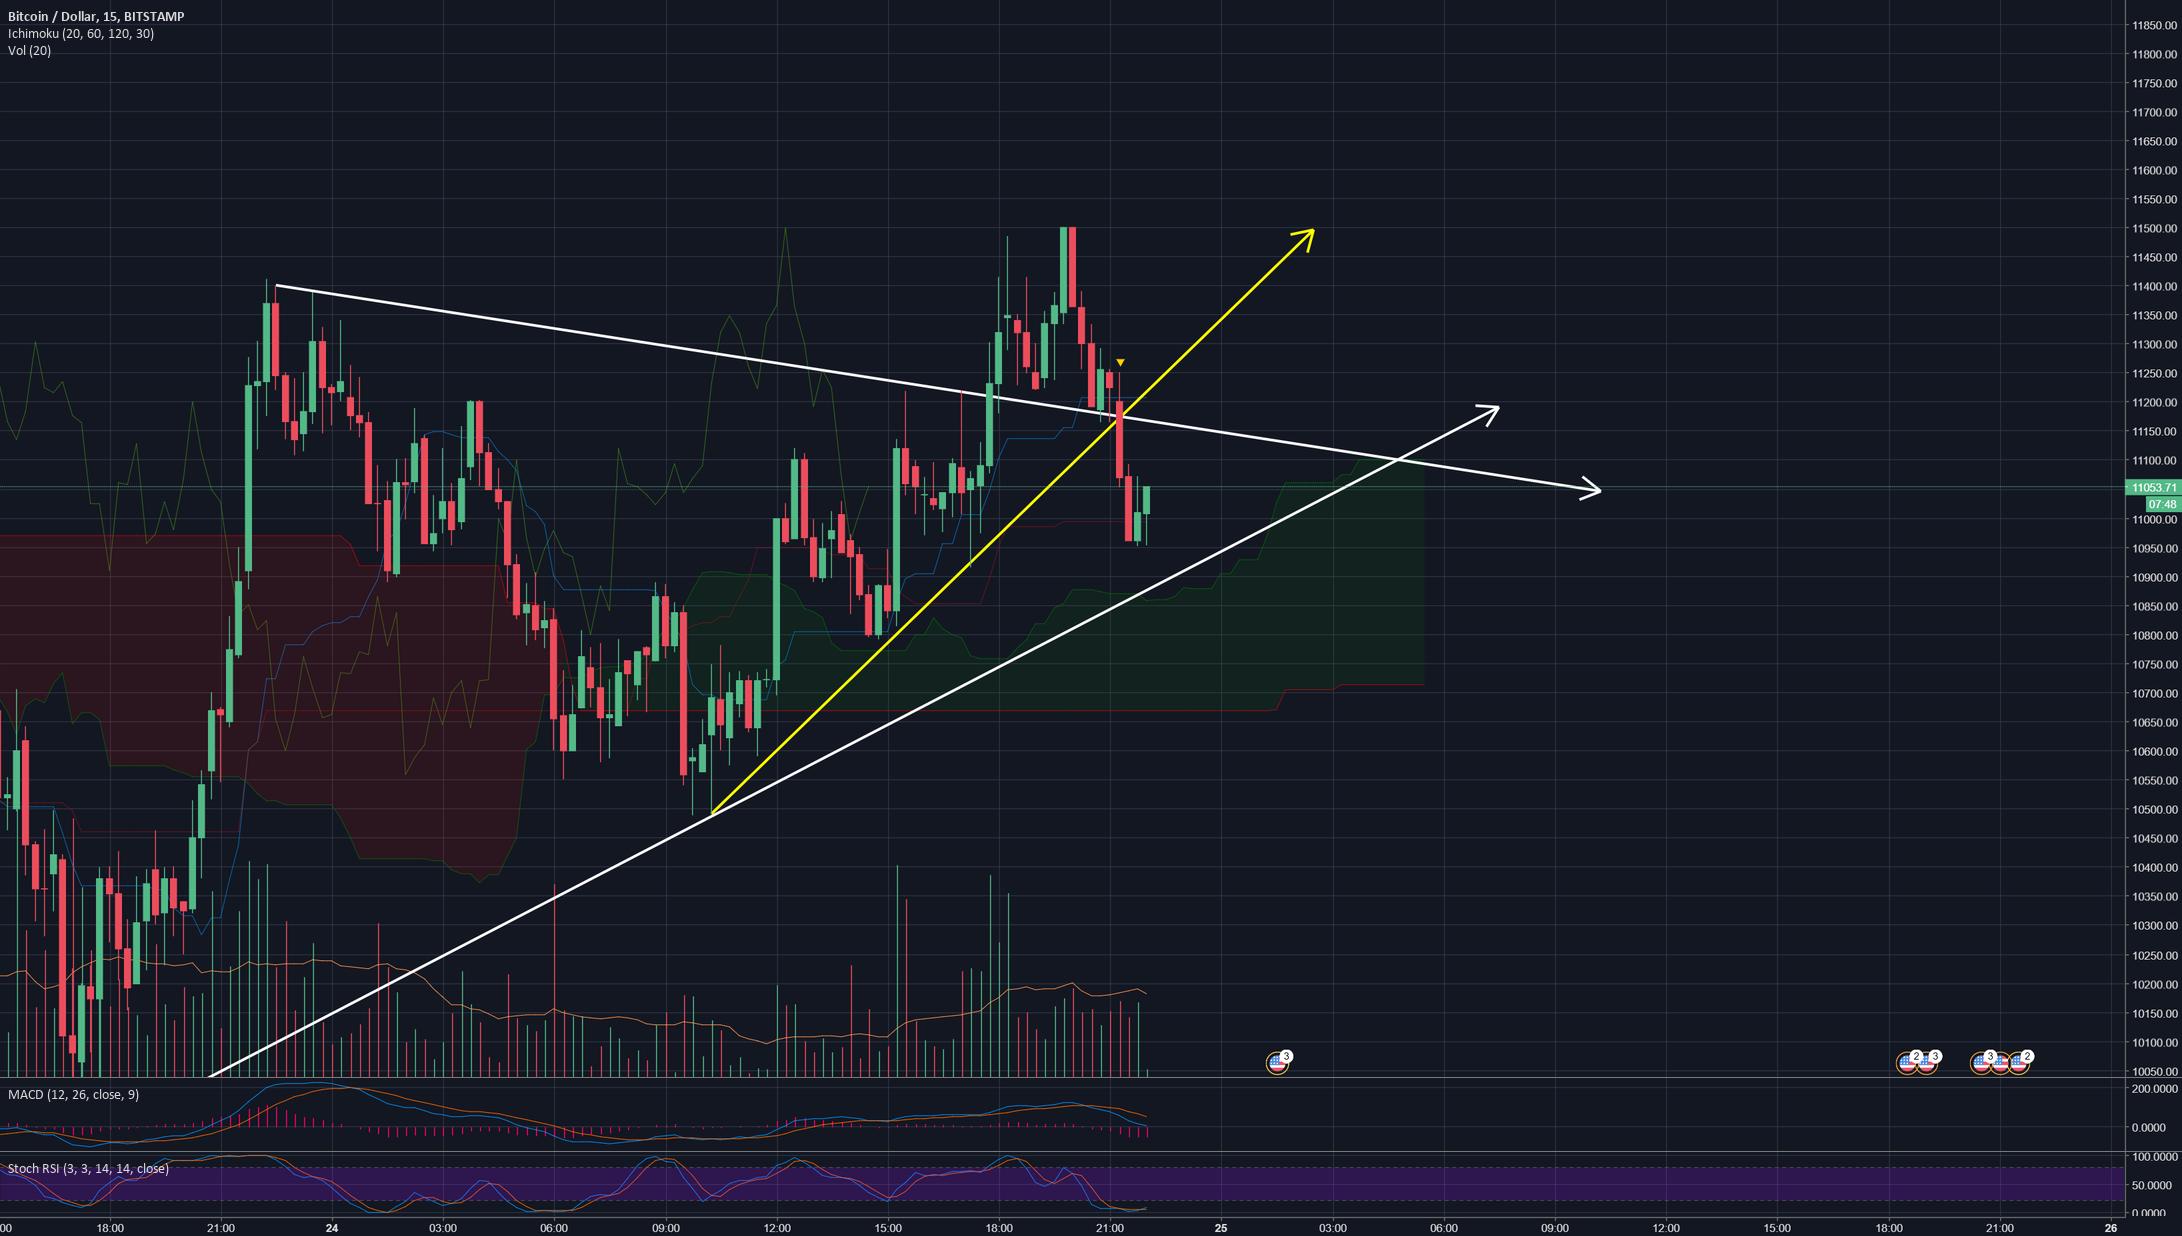 Bitcoin 15 MIn chart - Update